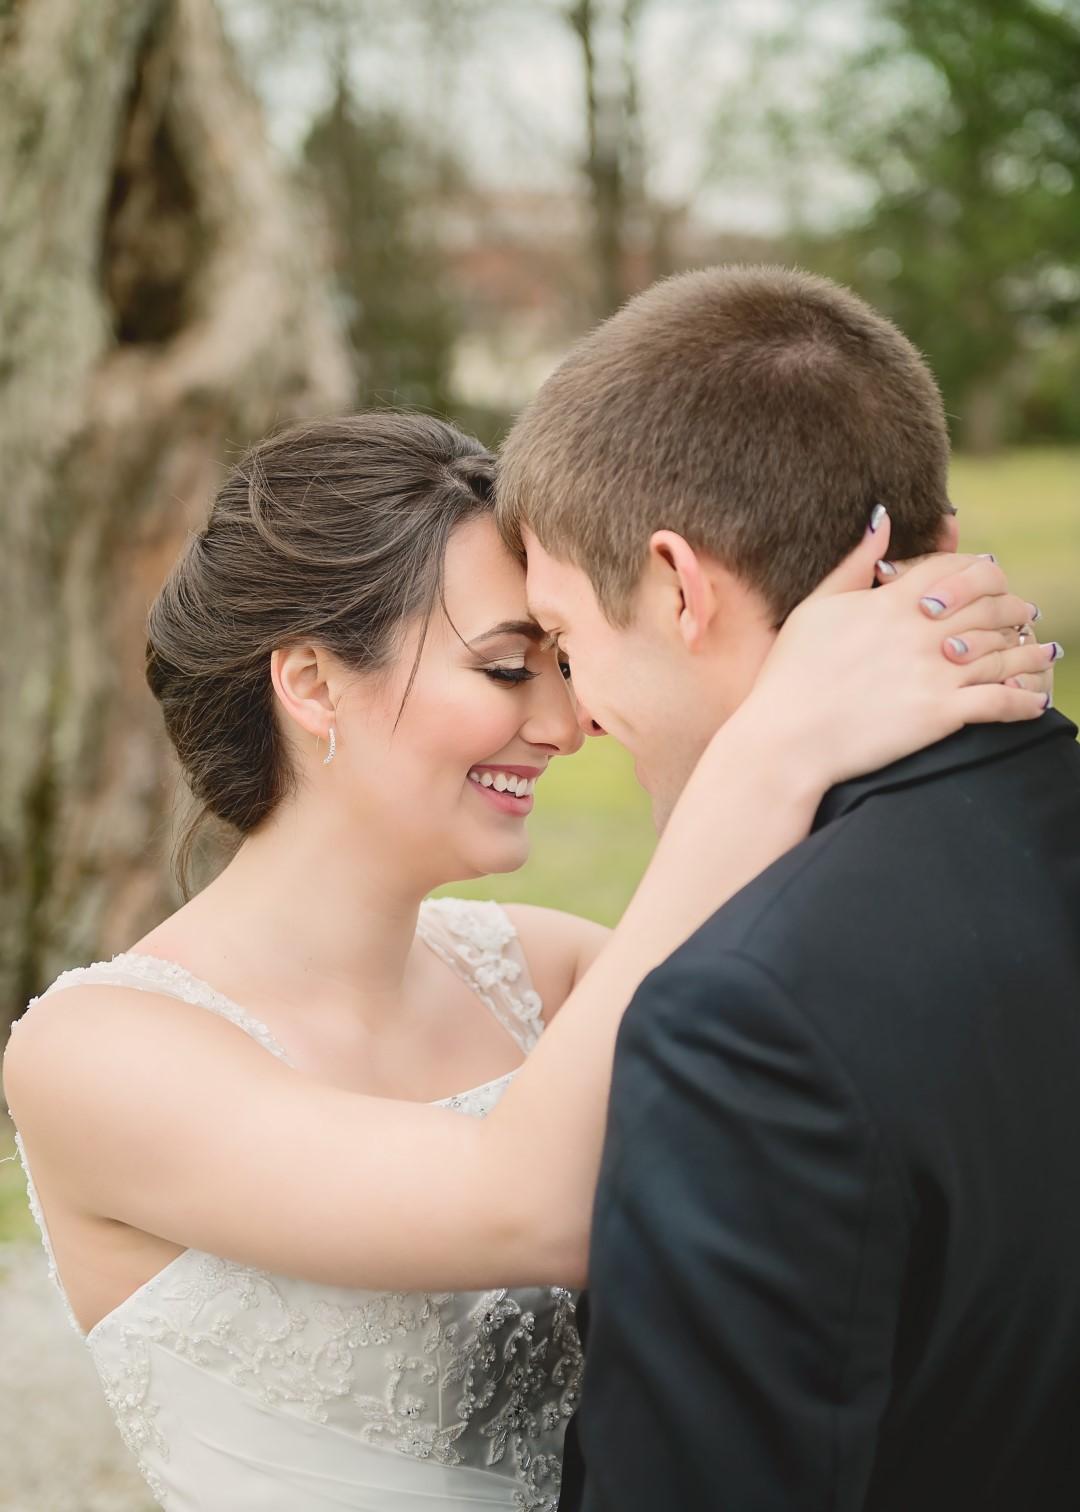 Haught Wedding 01 (Large).jpg